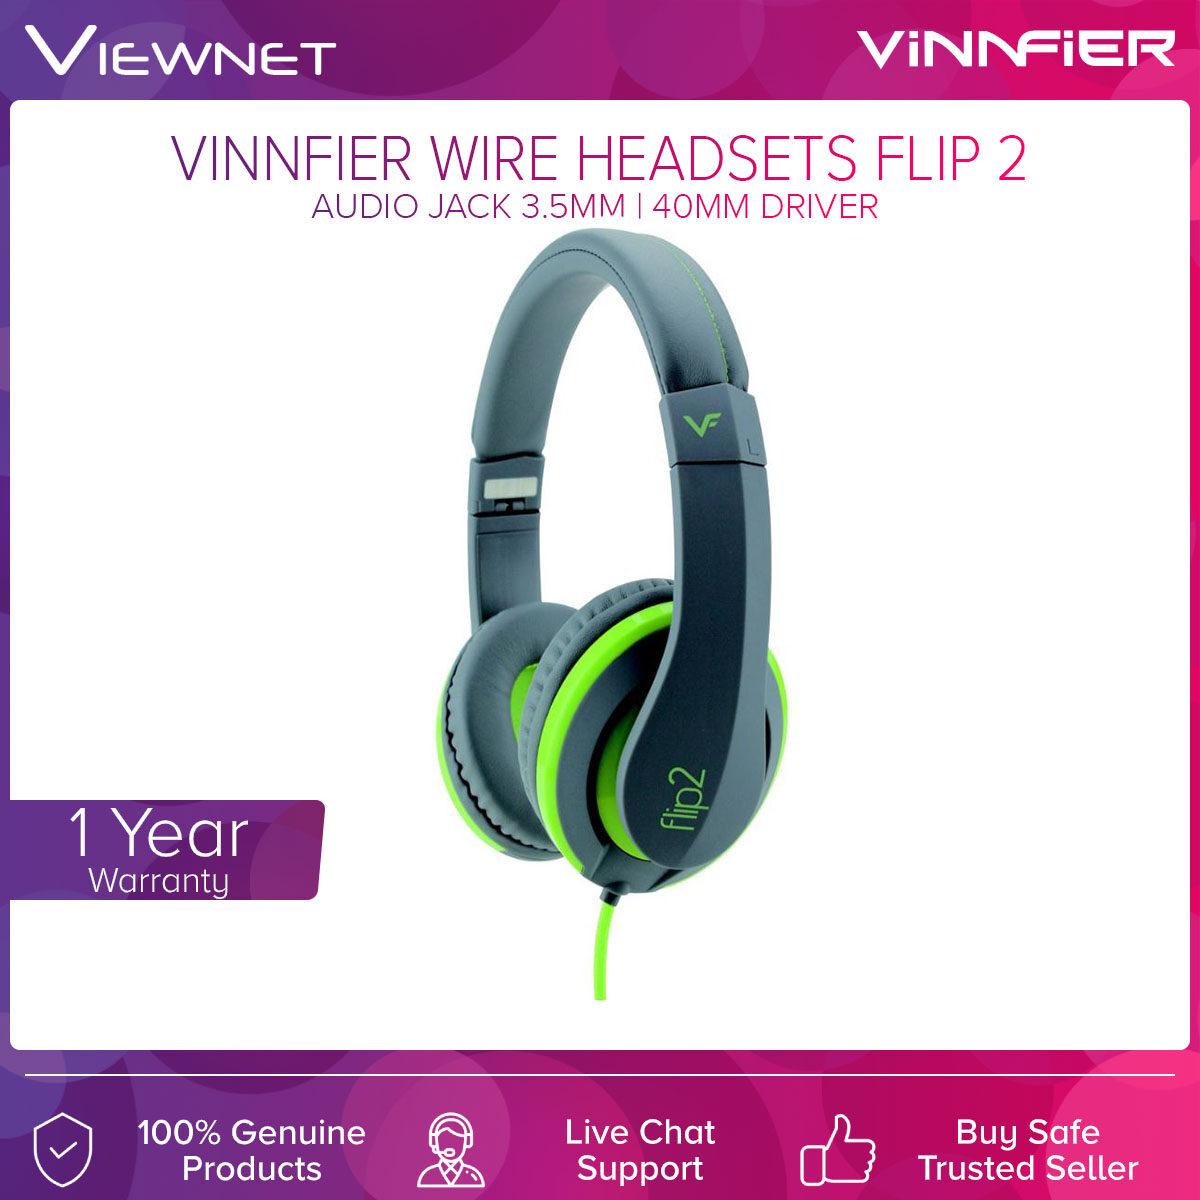 Vinnfier Wire Headset Flip 2 with 40MM Driver, 3.5MM Audio Jack, Lightweight Design, Built-In Mic